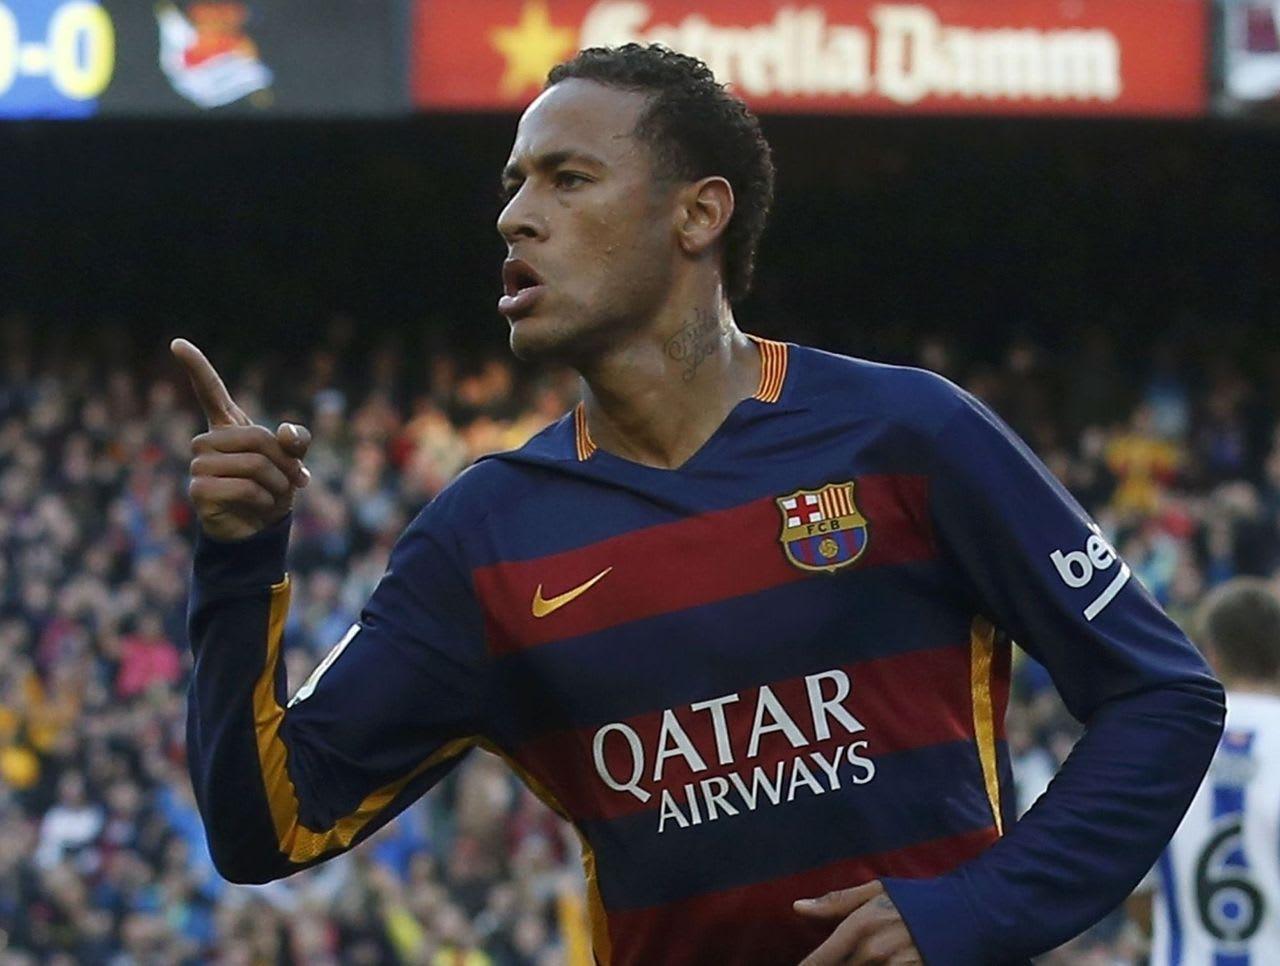 Neymar Cut Hair To Look Like Stephen Curry